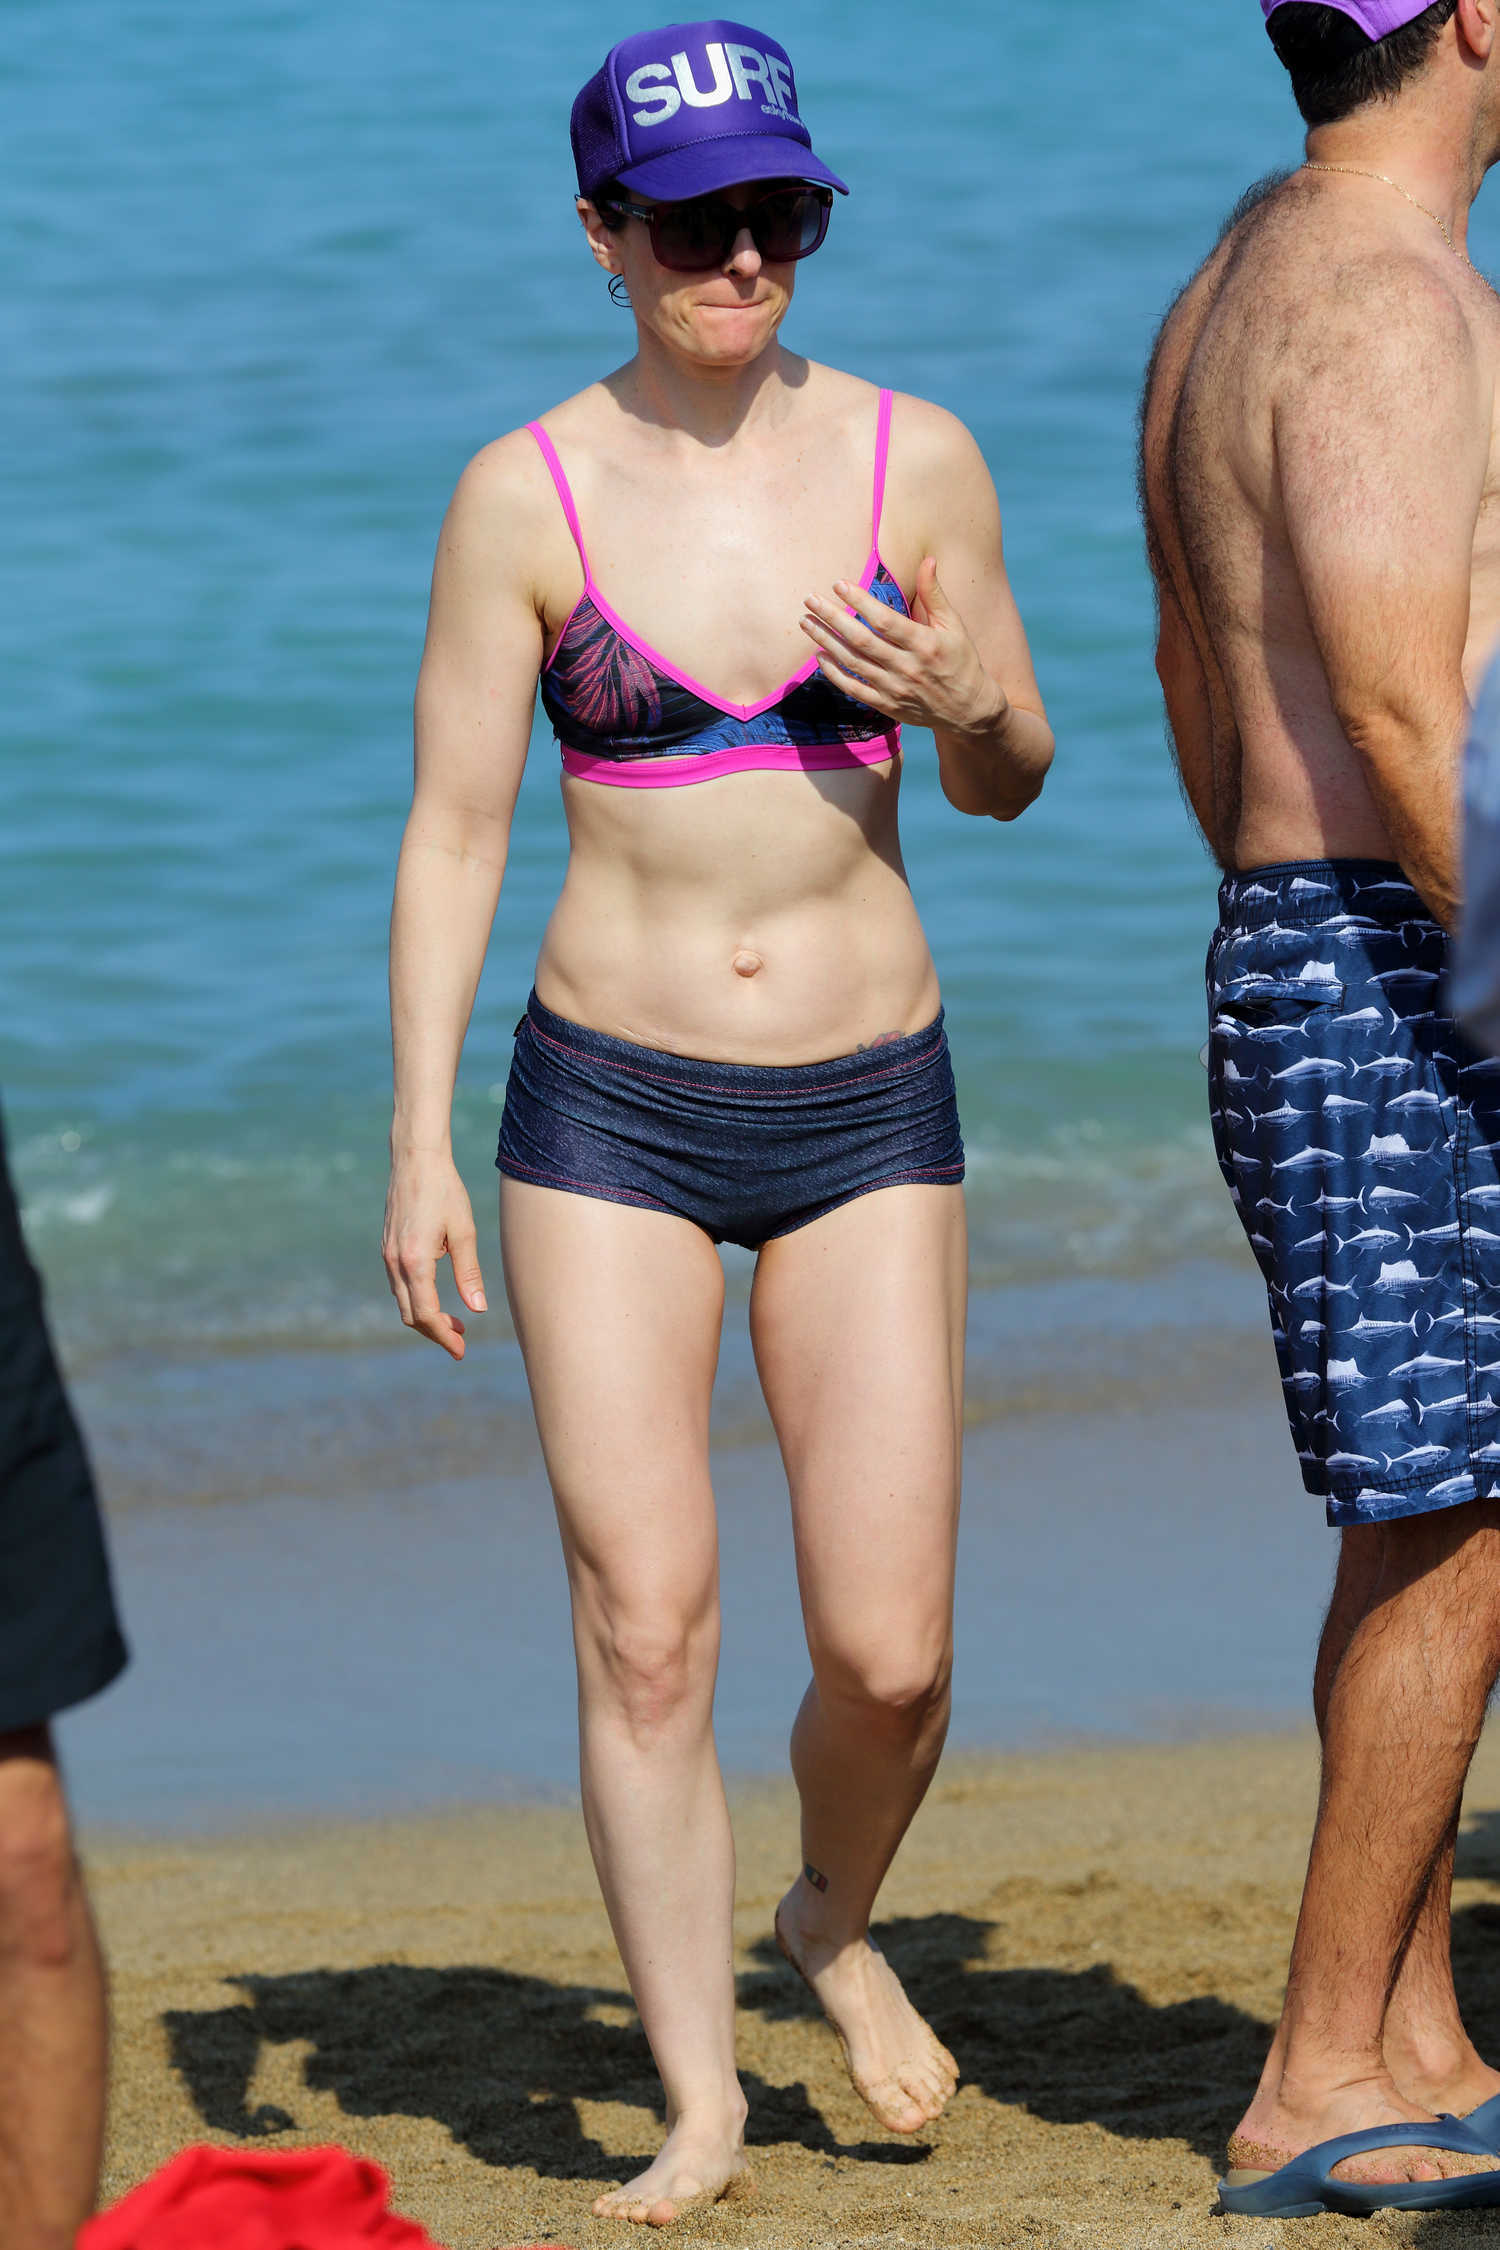 Lisa kennedy montgomery nude